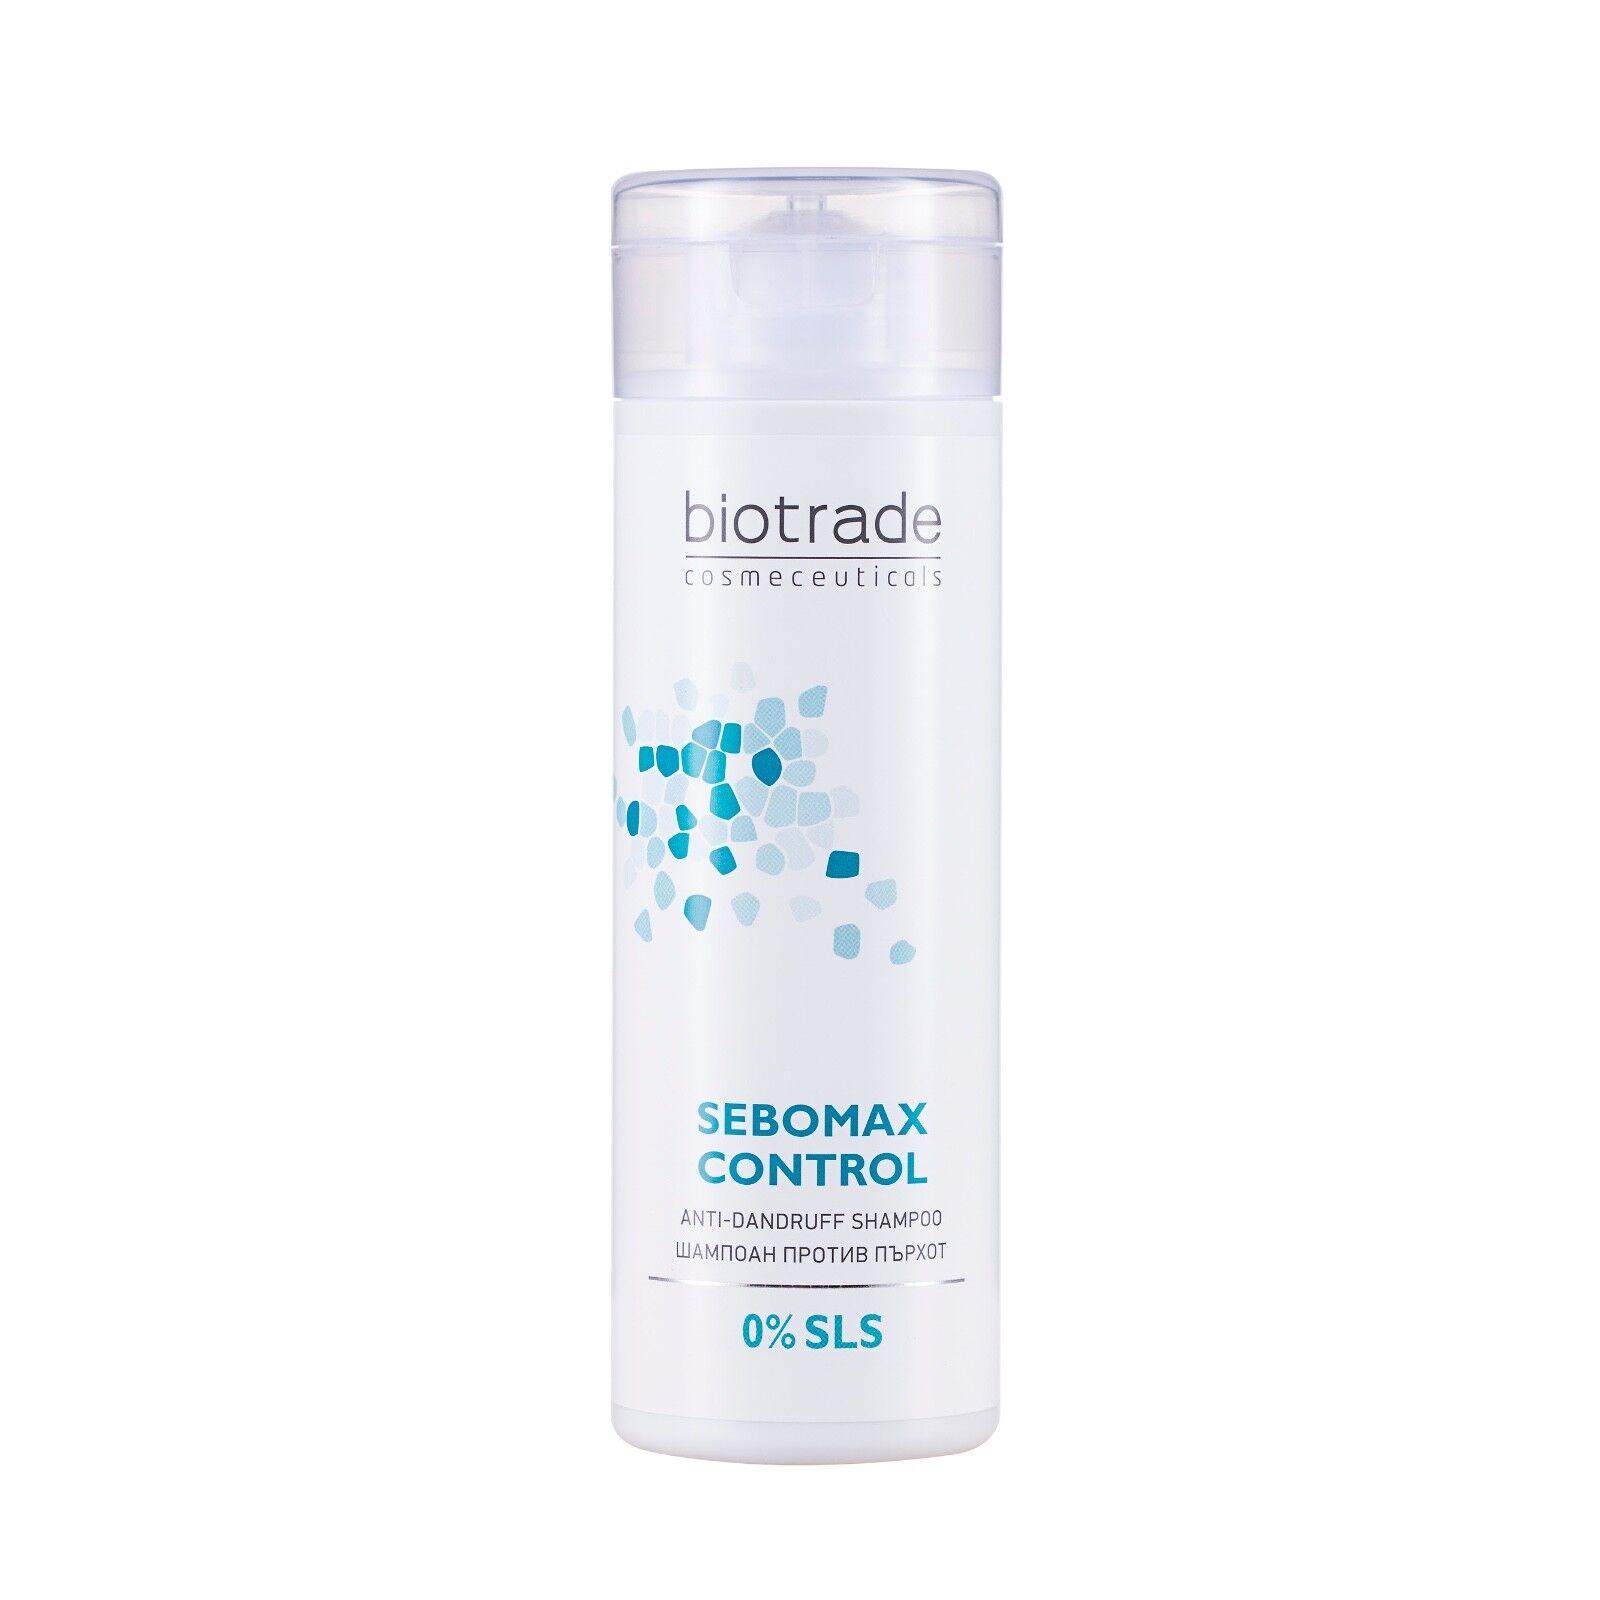 Biotrade Sebomax Anti Dandruff Shampoo Control 200 Ml Sls And Sles Pantene Dandruf 750ml Norton Secured Powered By Verisign